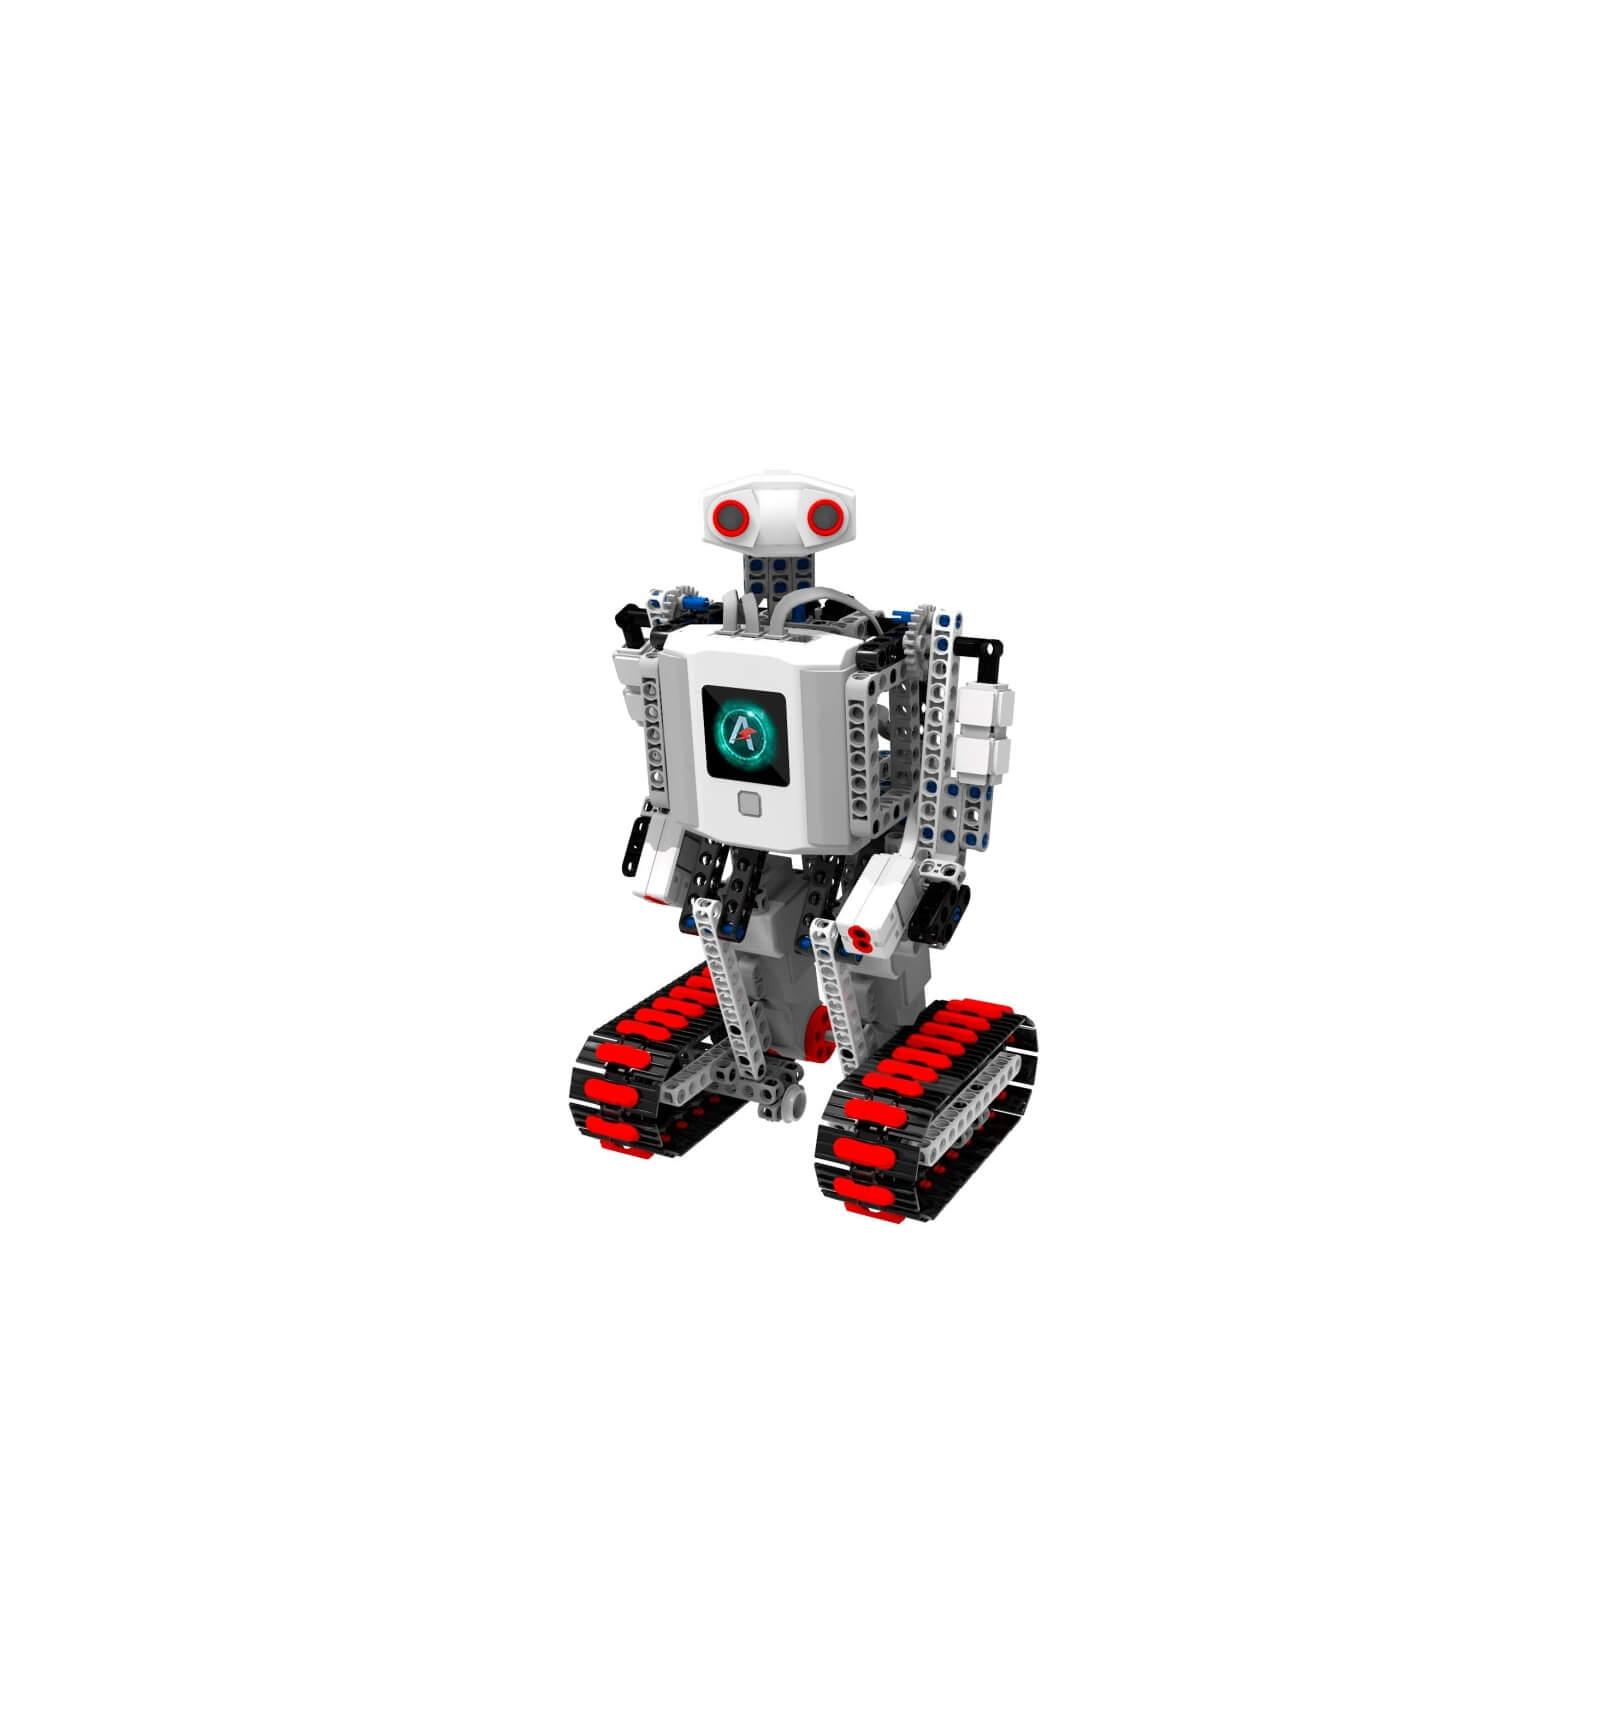 Krypton 5 Abilix Educativa Robótica Brick De Kit zqSMpVU